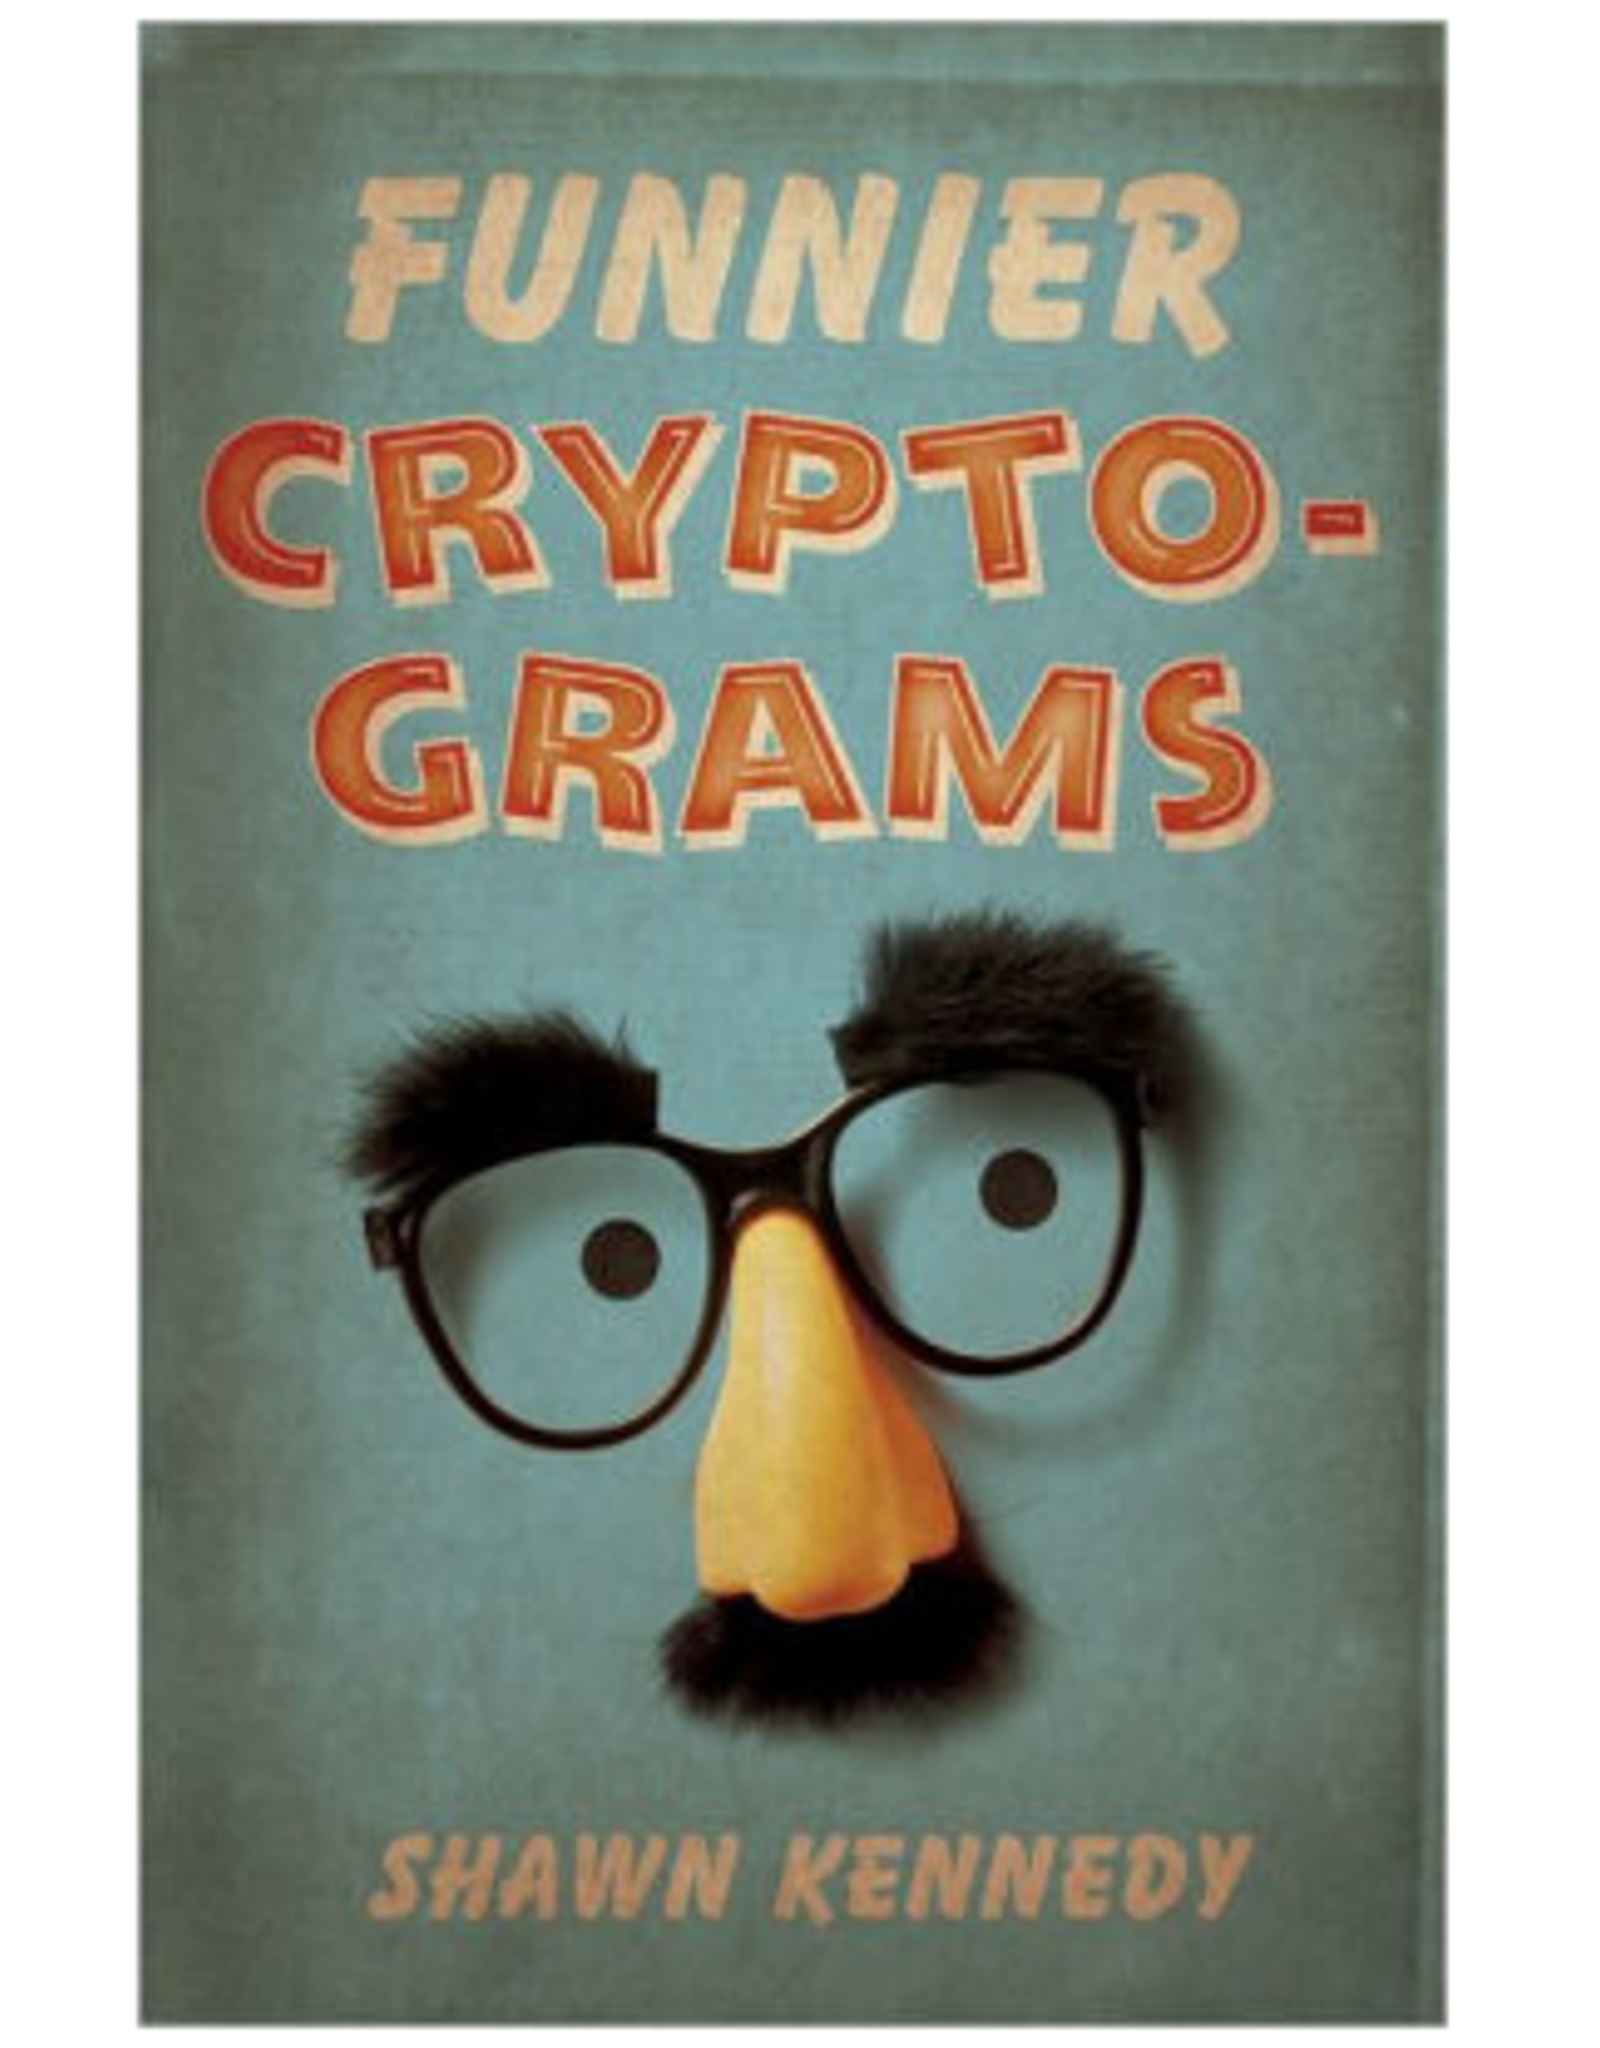 Funnier Cryptograms